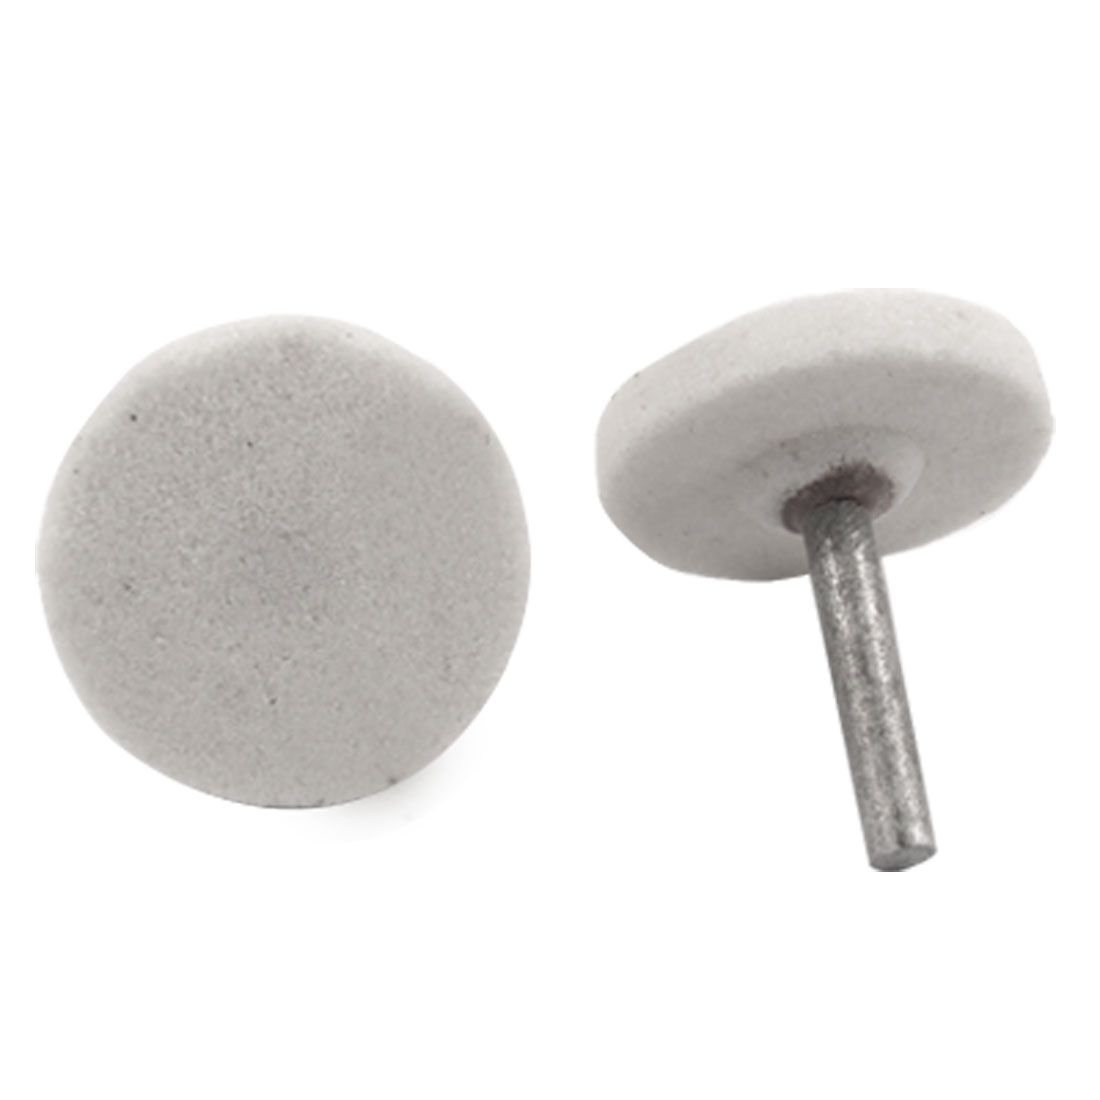 5 Pcs White Ceramic Stone Grinding Wheel Head Metal Shank Mounted Point